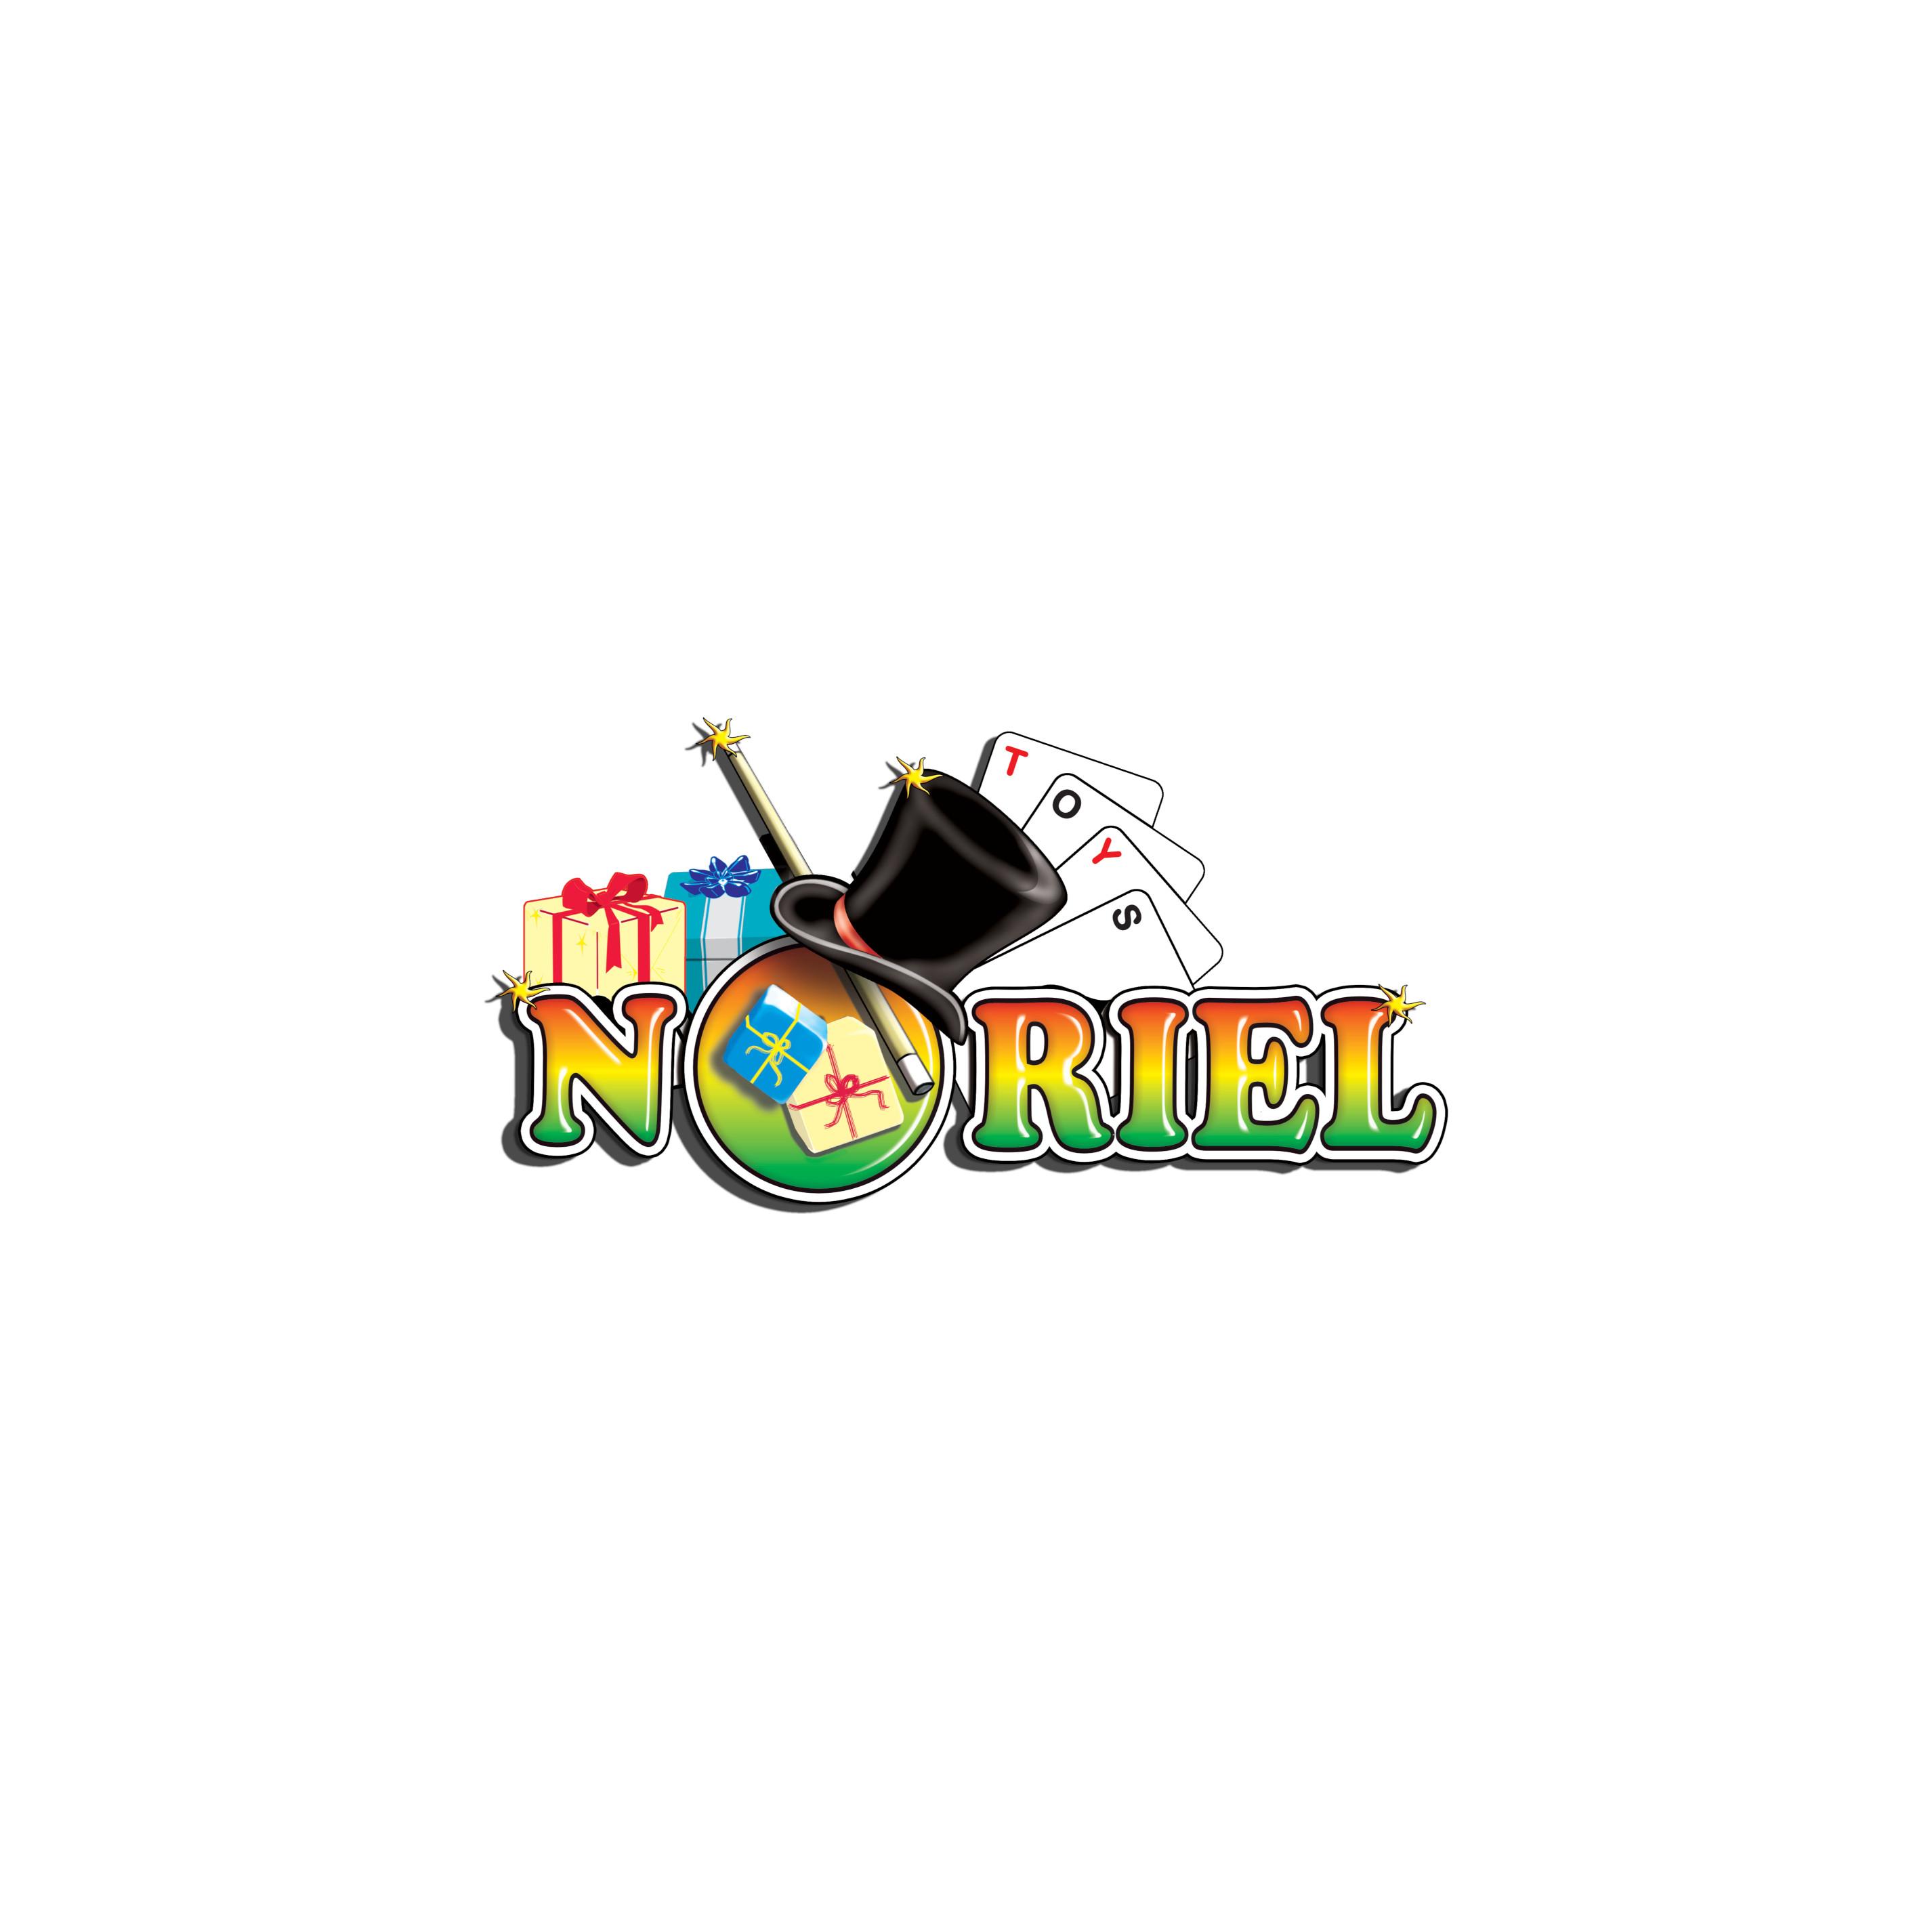 0112-GB01_001w Rucsac Paddlepak Clown Trunki, Peste